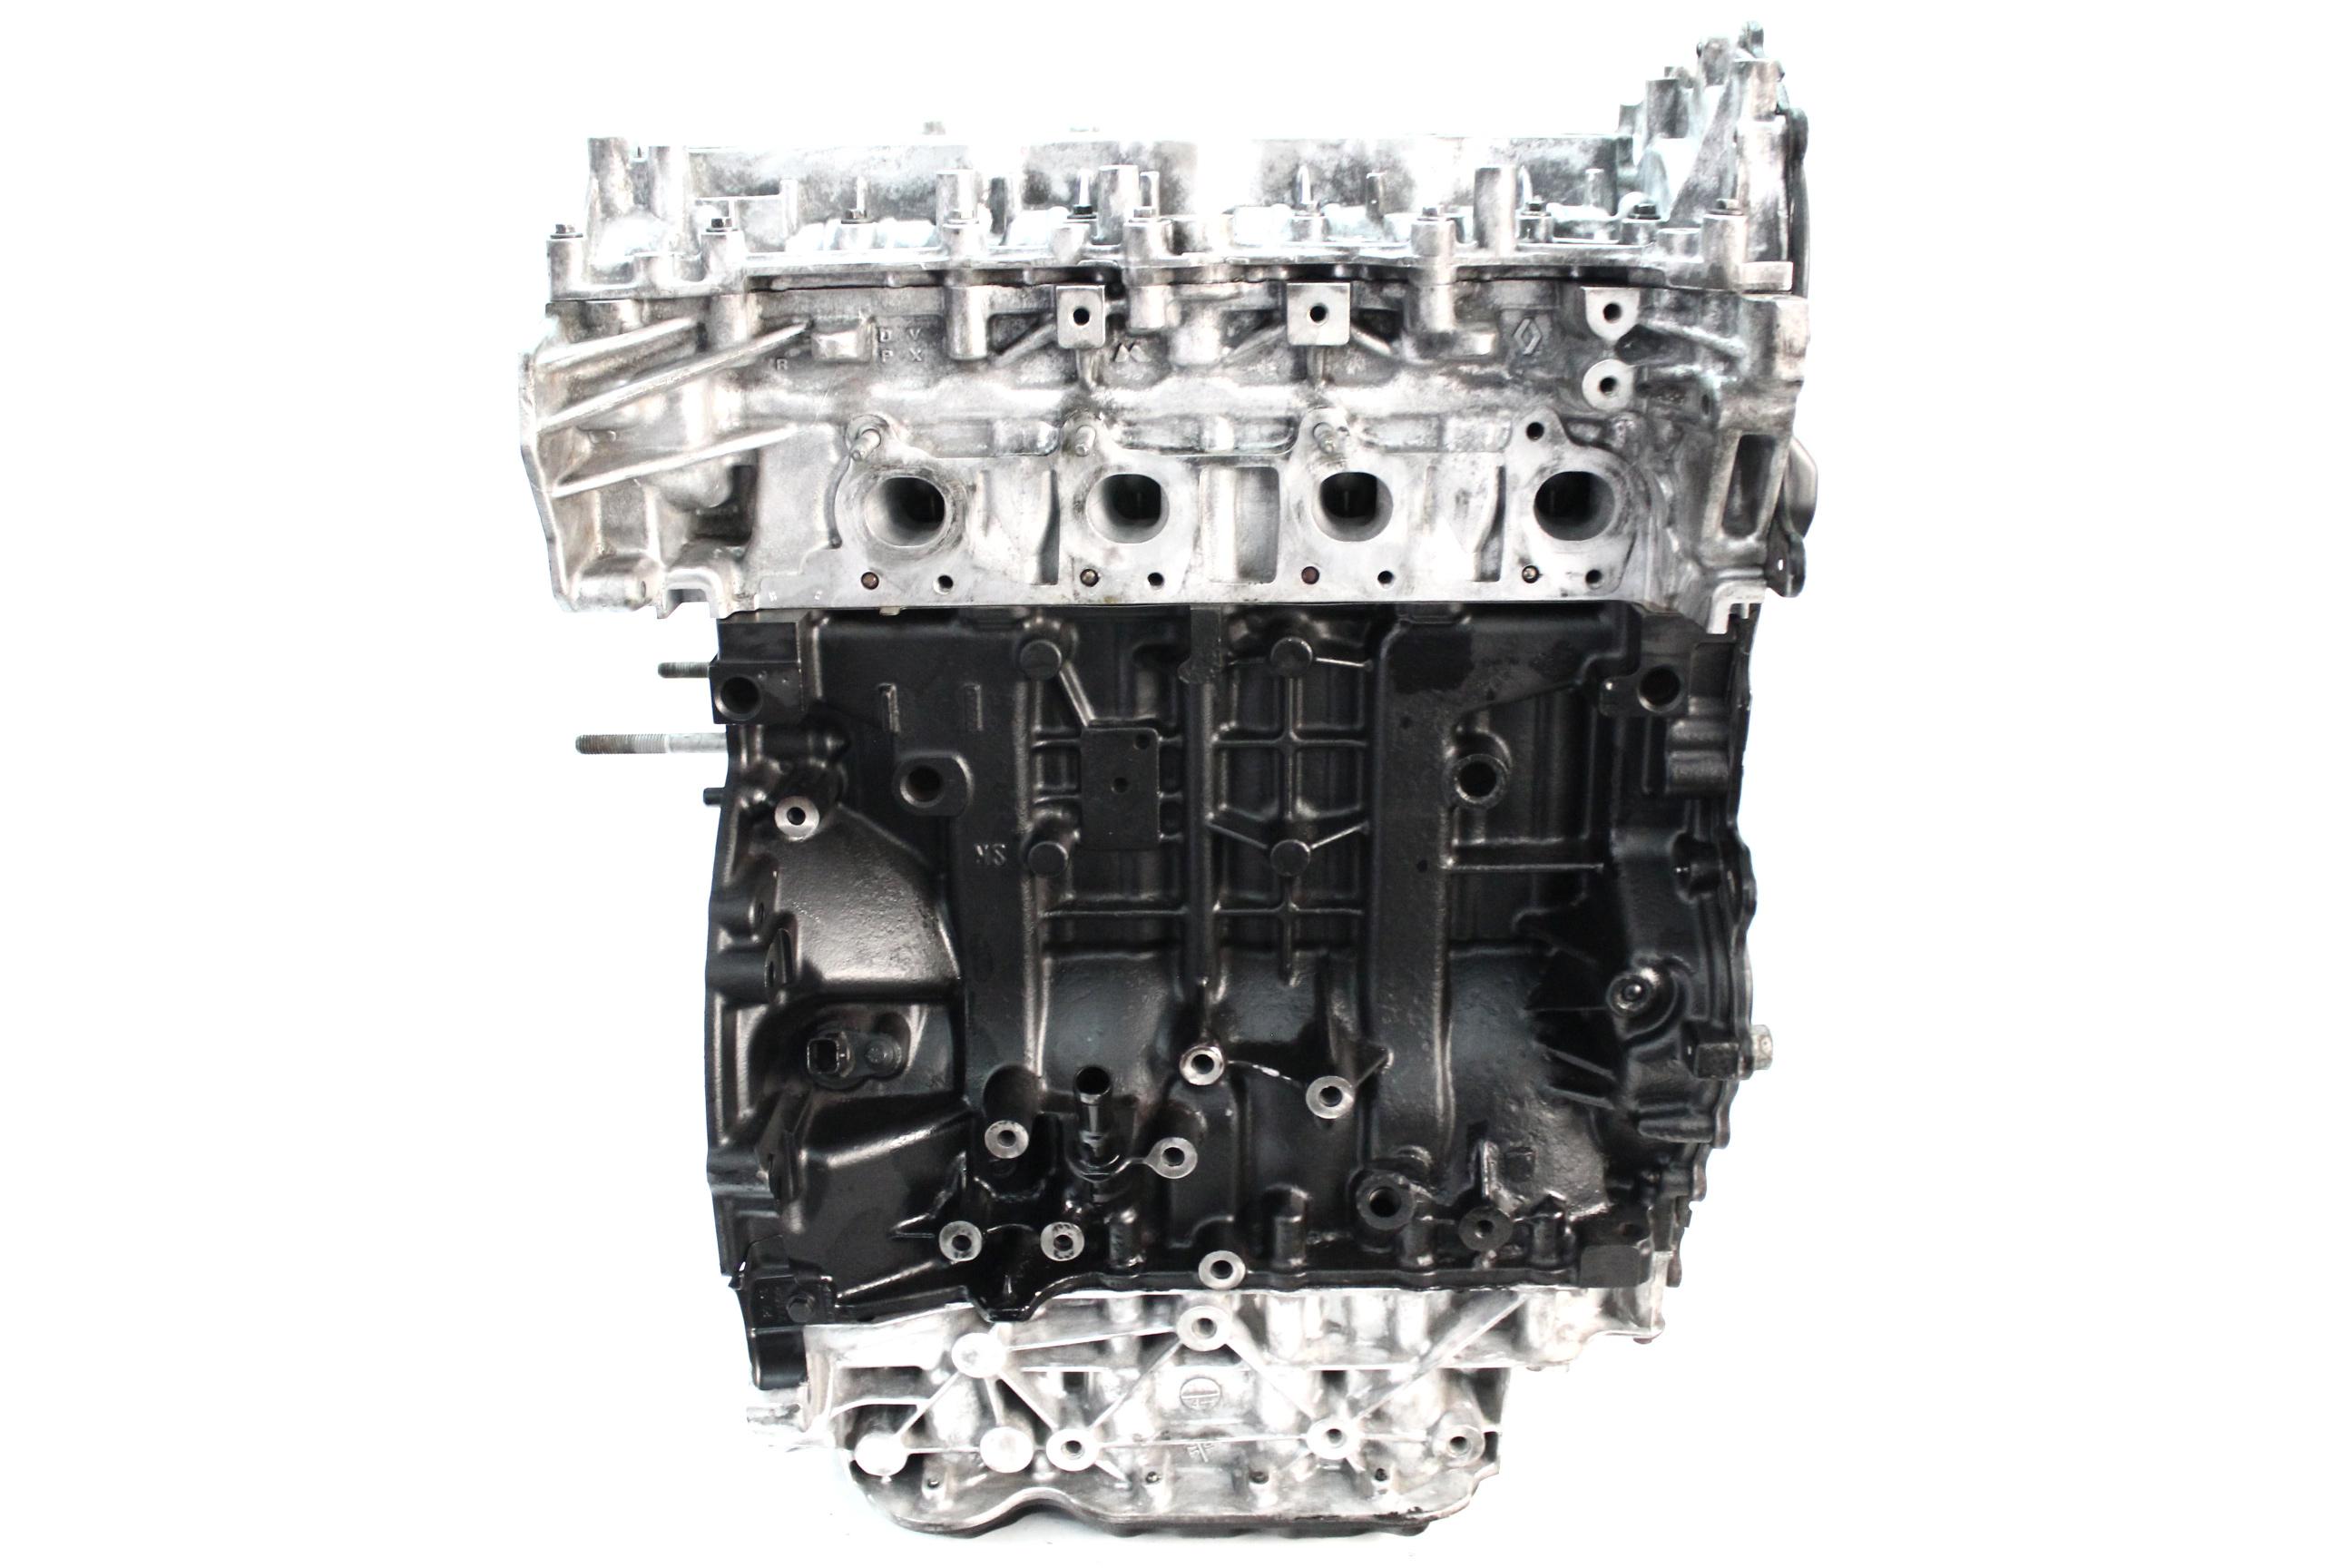 Motor 2010 für Nissan Opel Renault Movano Master 2,3 D Diesel M9T670 Kettensatz NEU